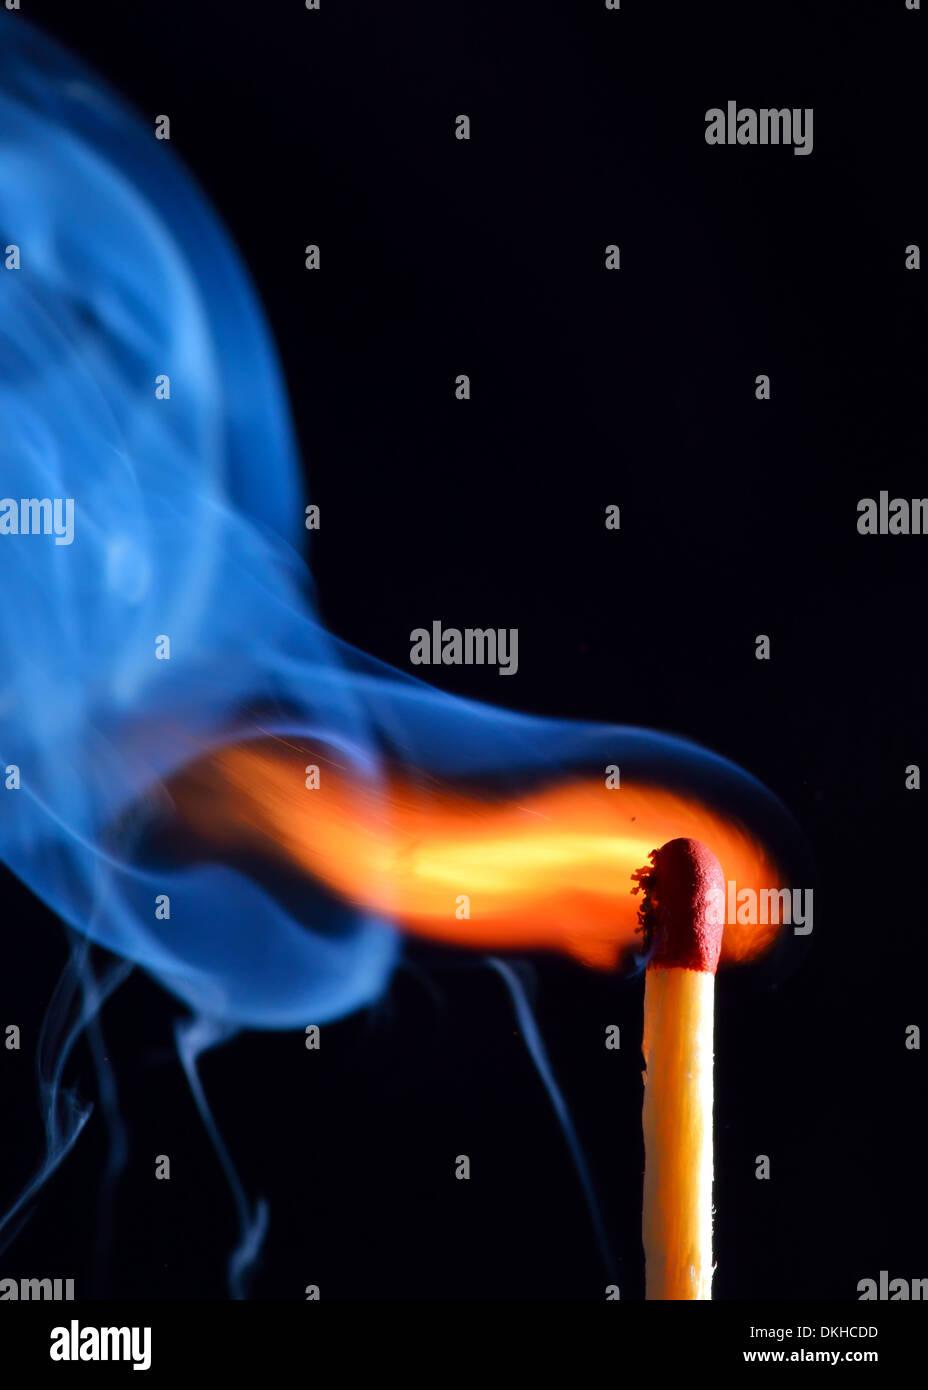 lighting a match on black background - Stock Image